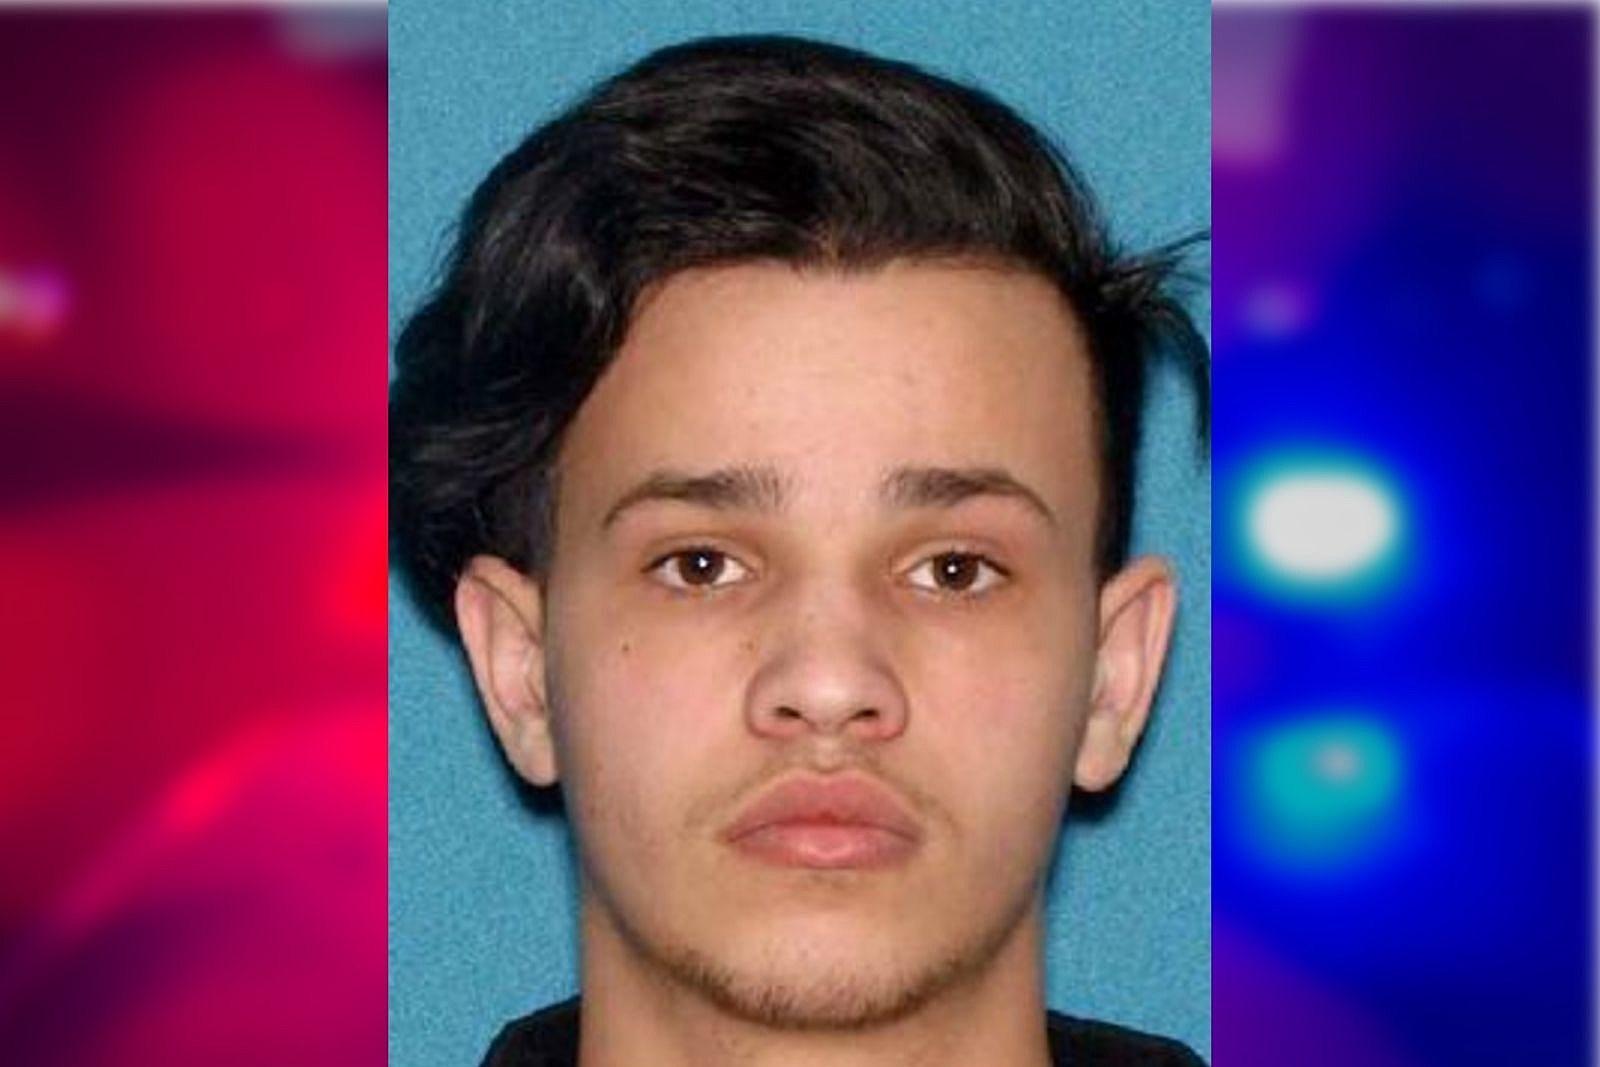 Lakewood, NJ man, 18, charged in crash that killed Brick newlywed